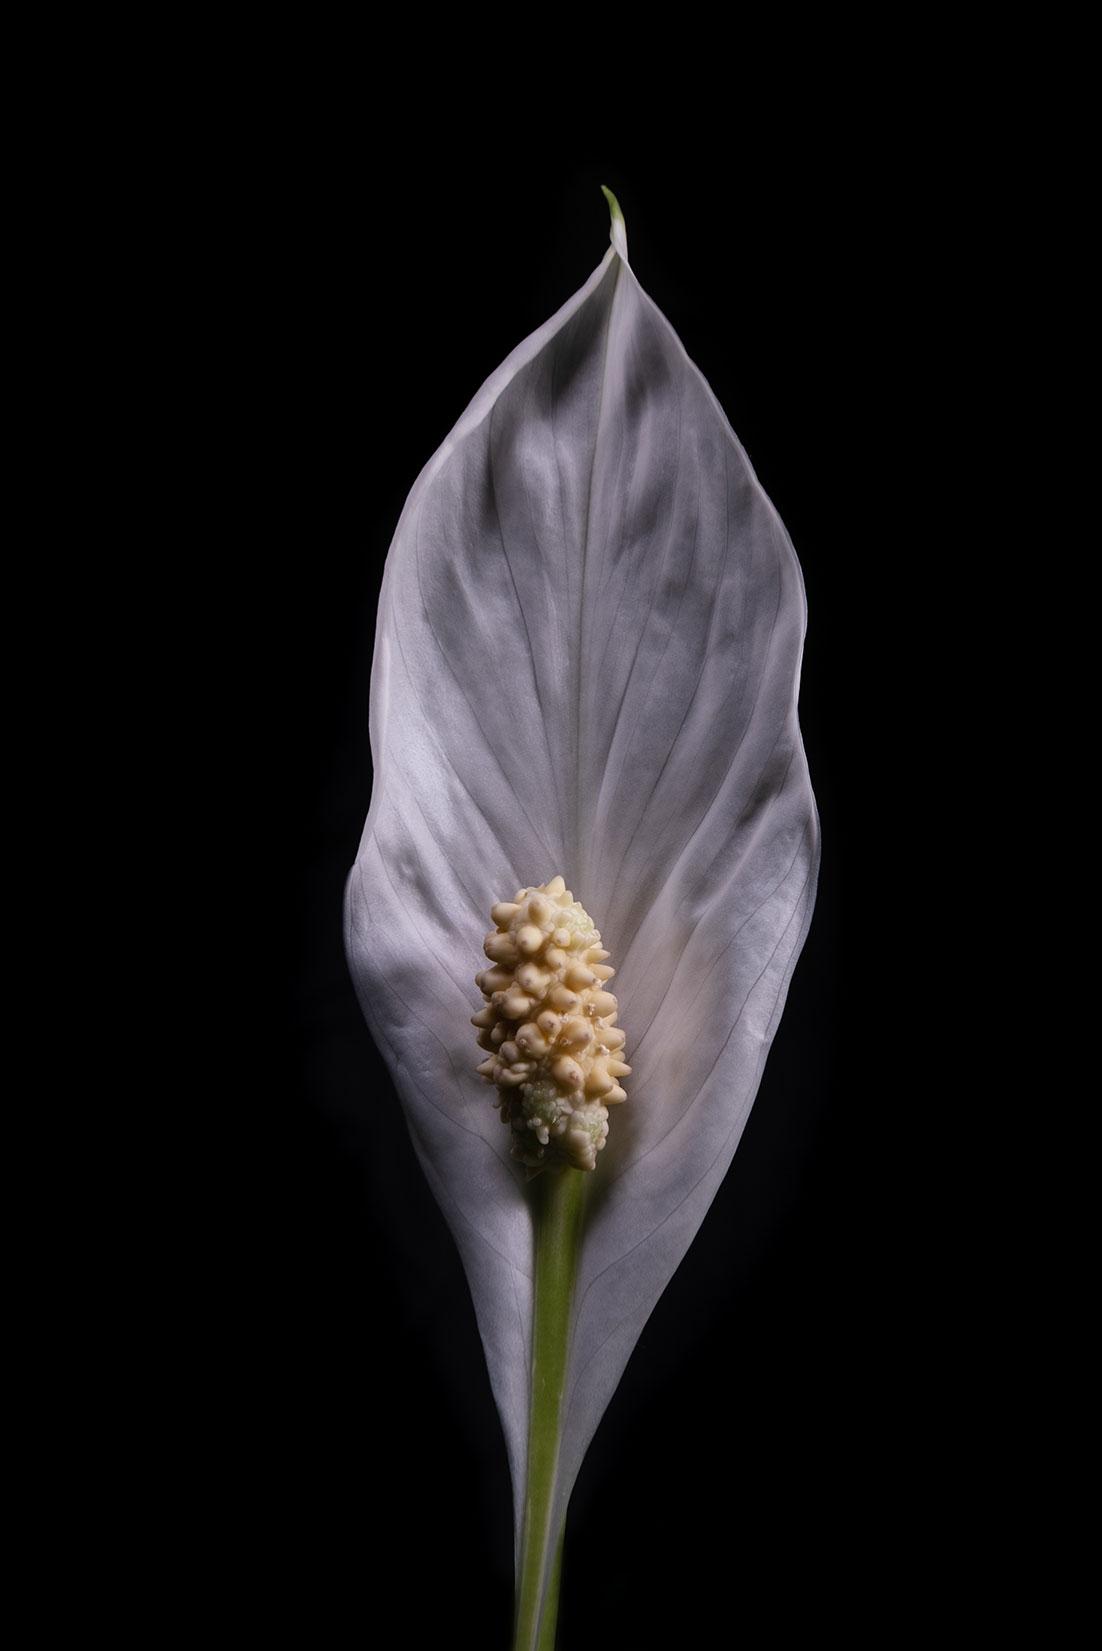 Spathiphyllum by Tiziano L. U. Caviglia